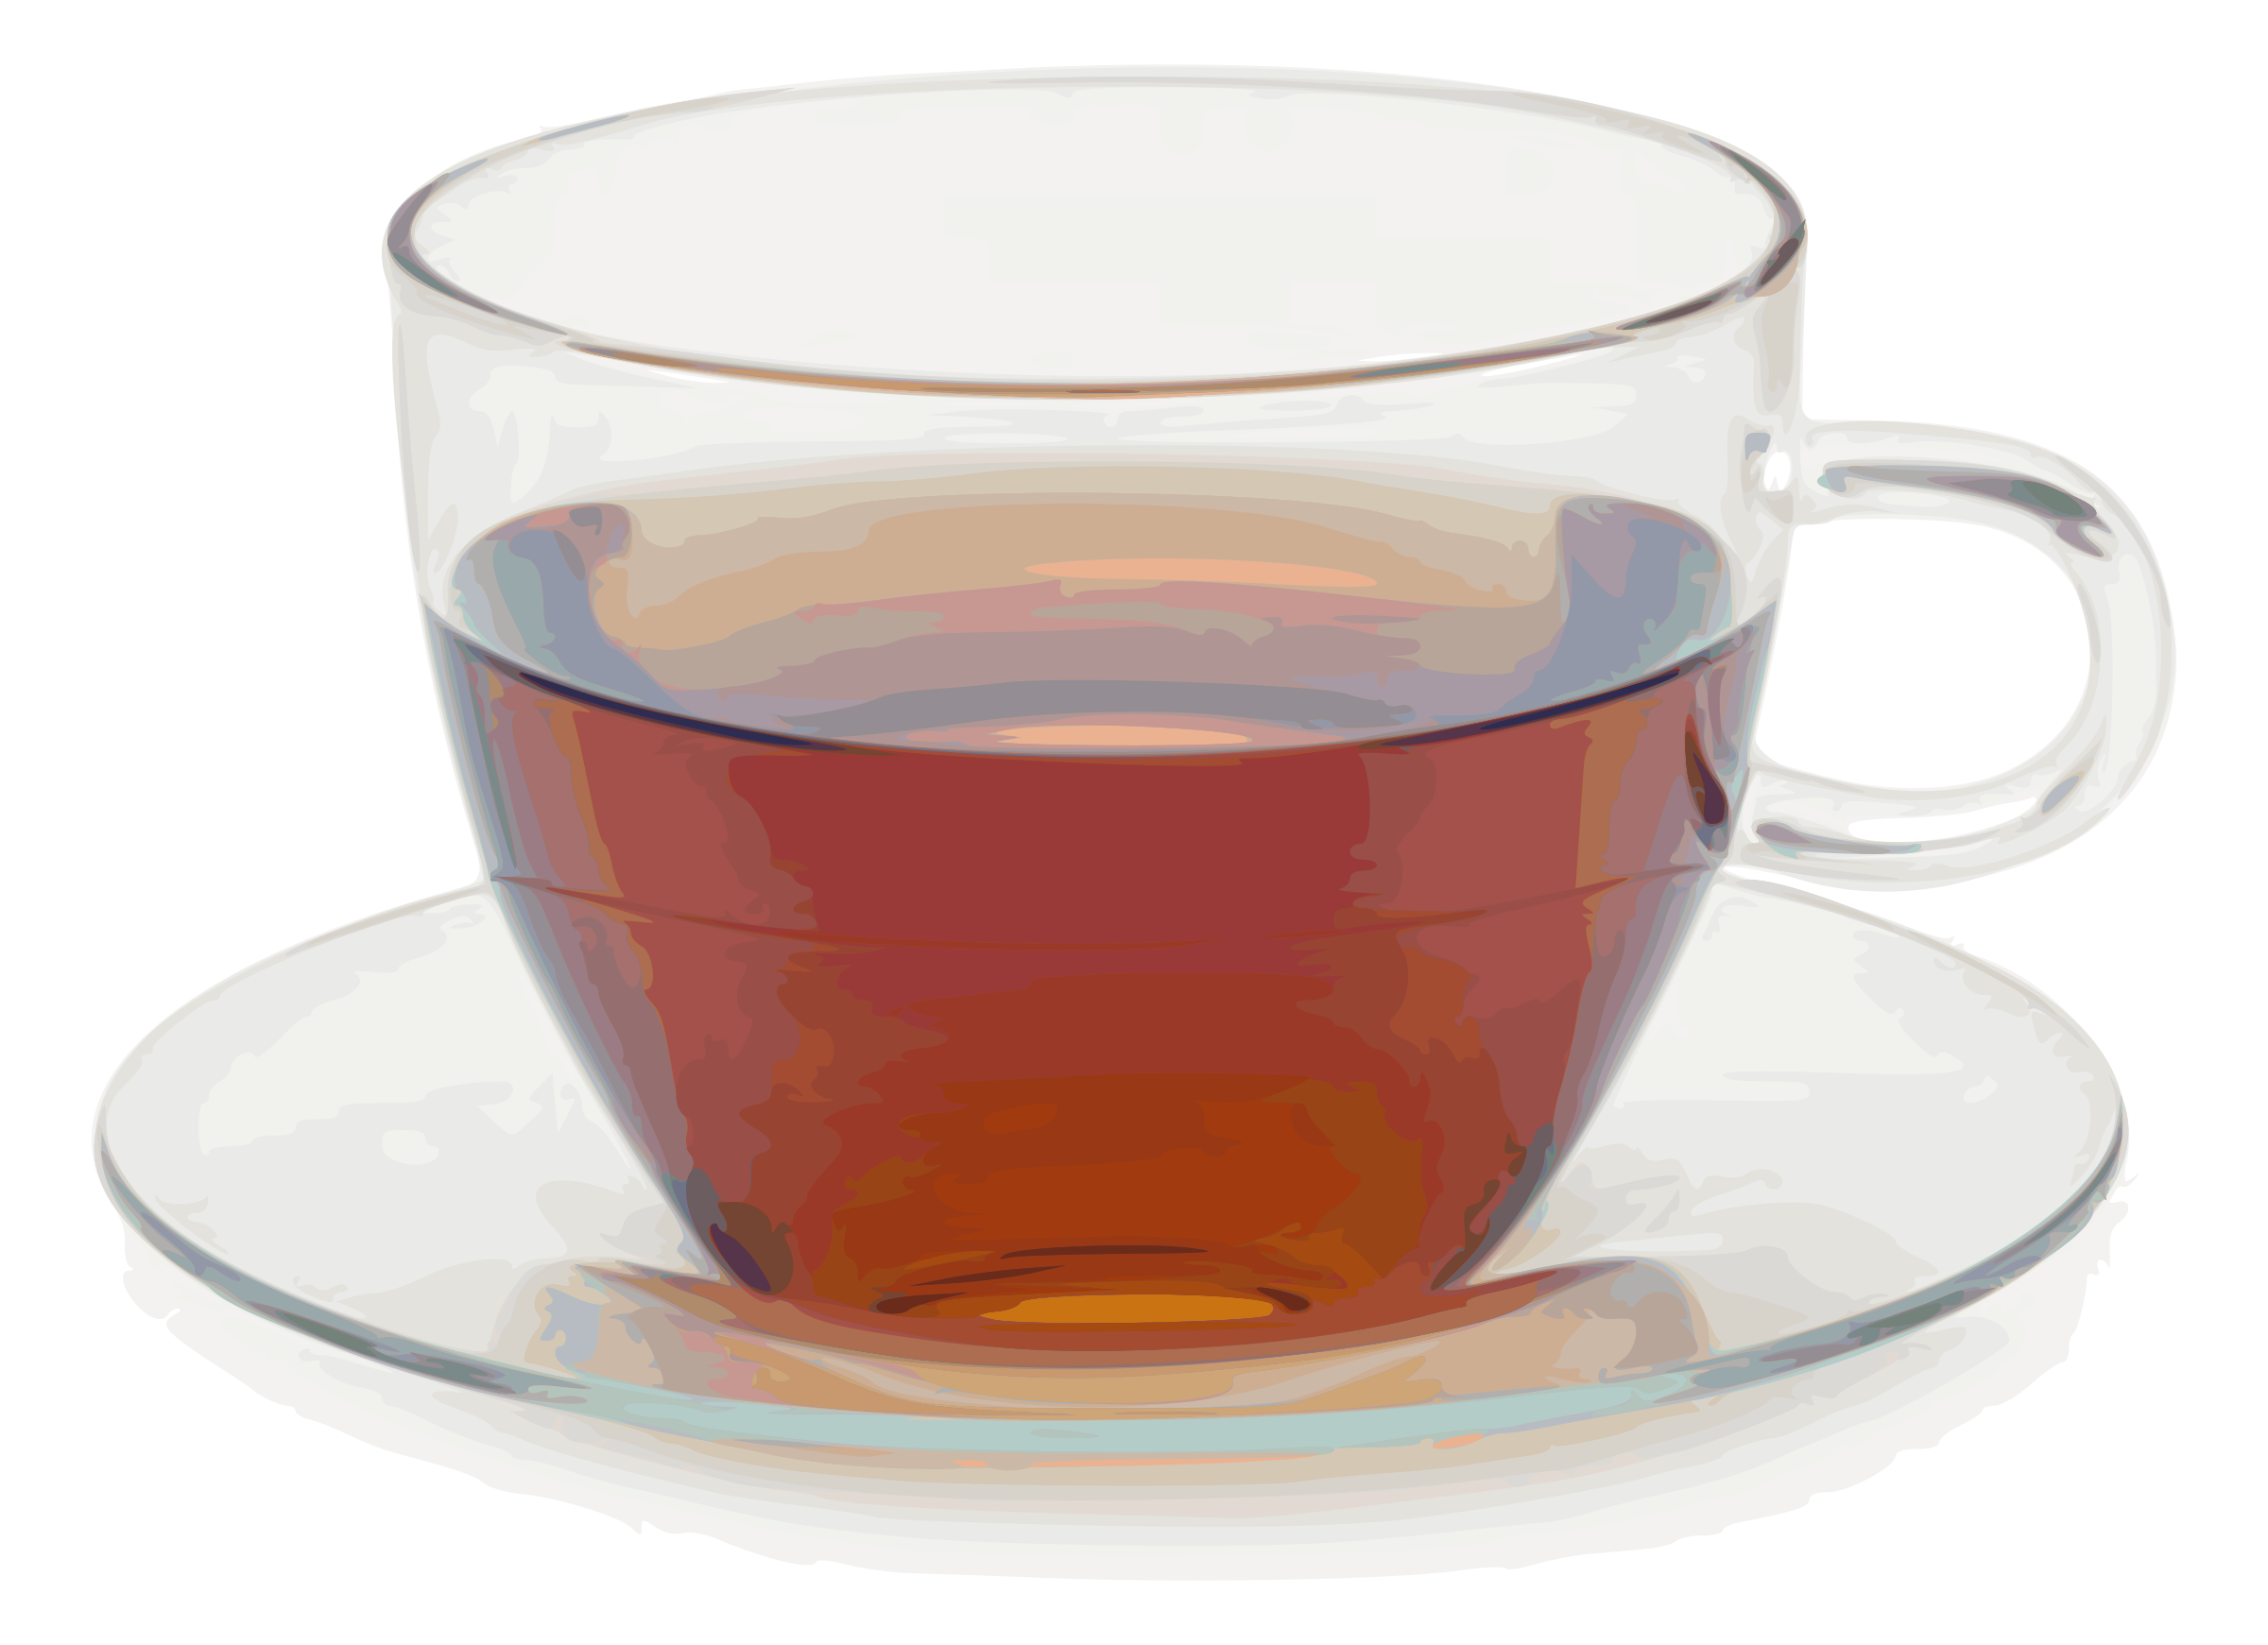 Money in glass cup clipart transparent Tea PNG Transparent Images | Free Download Clip Art | Free Clip ... transparent